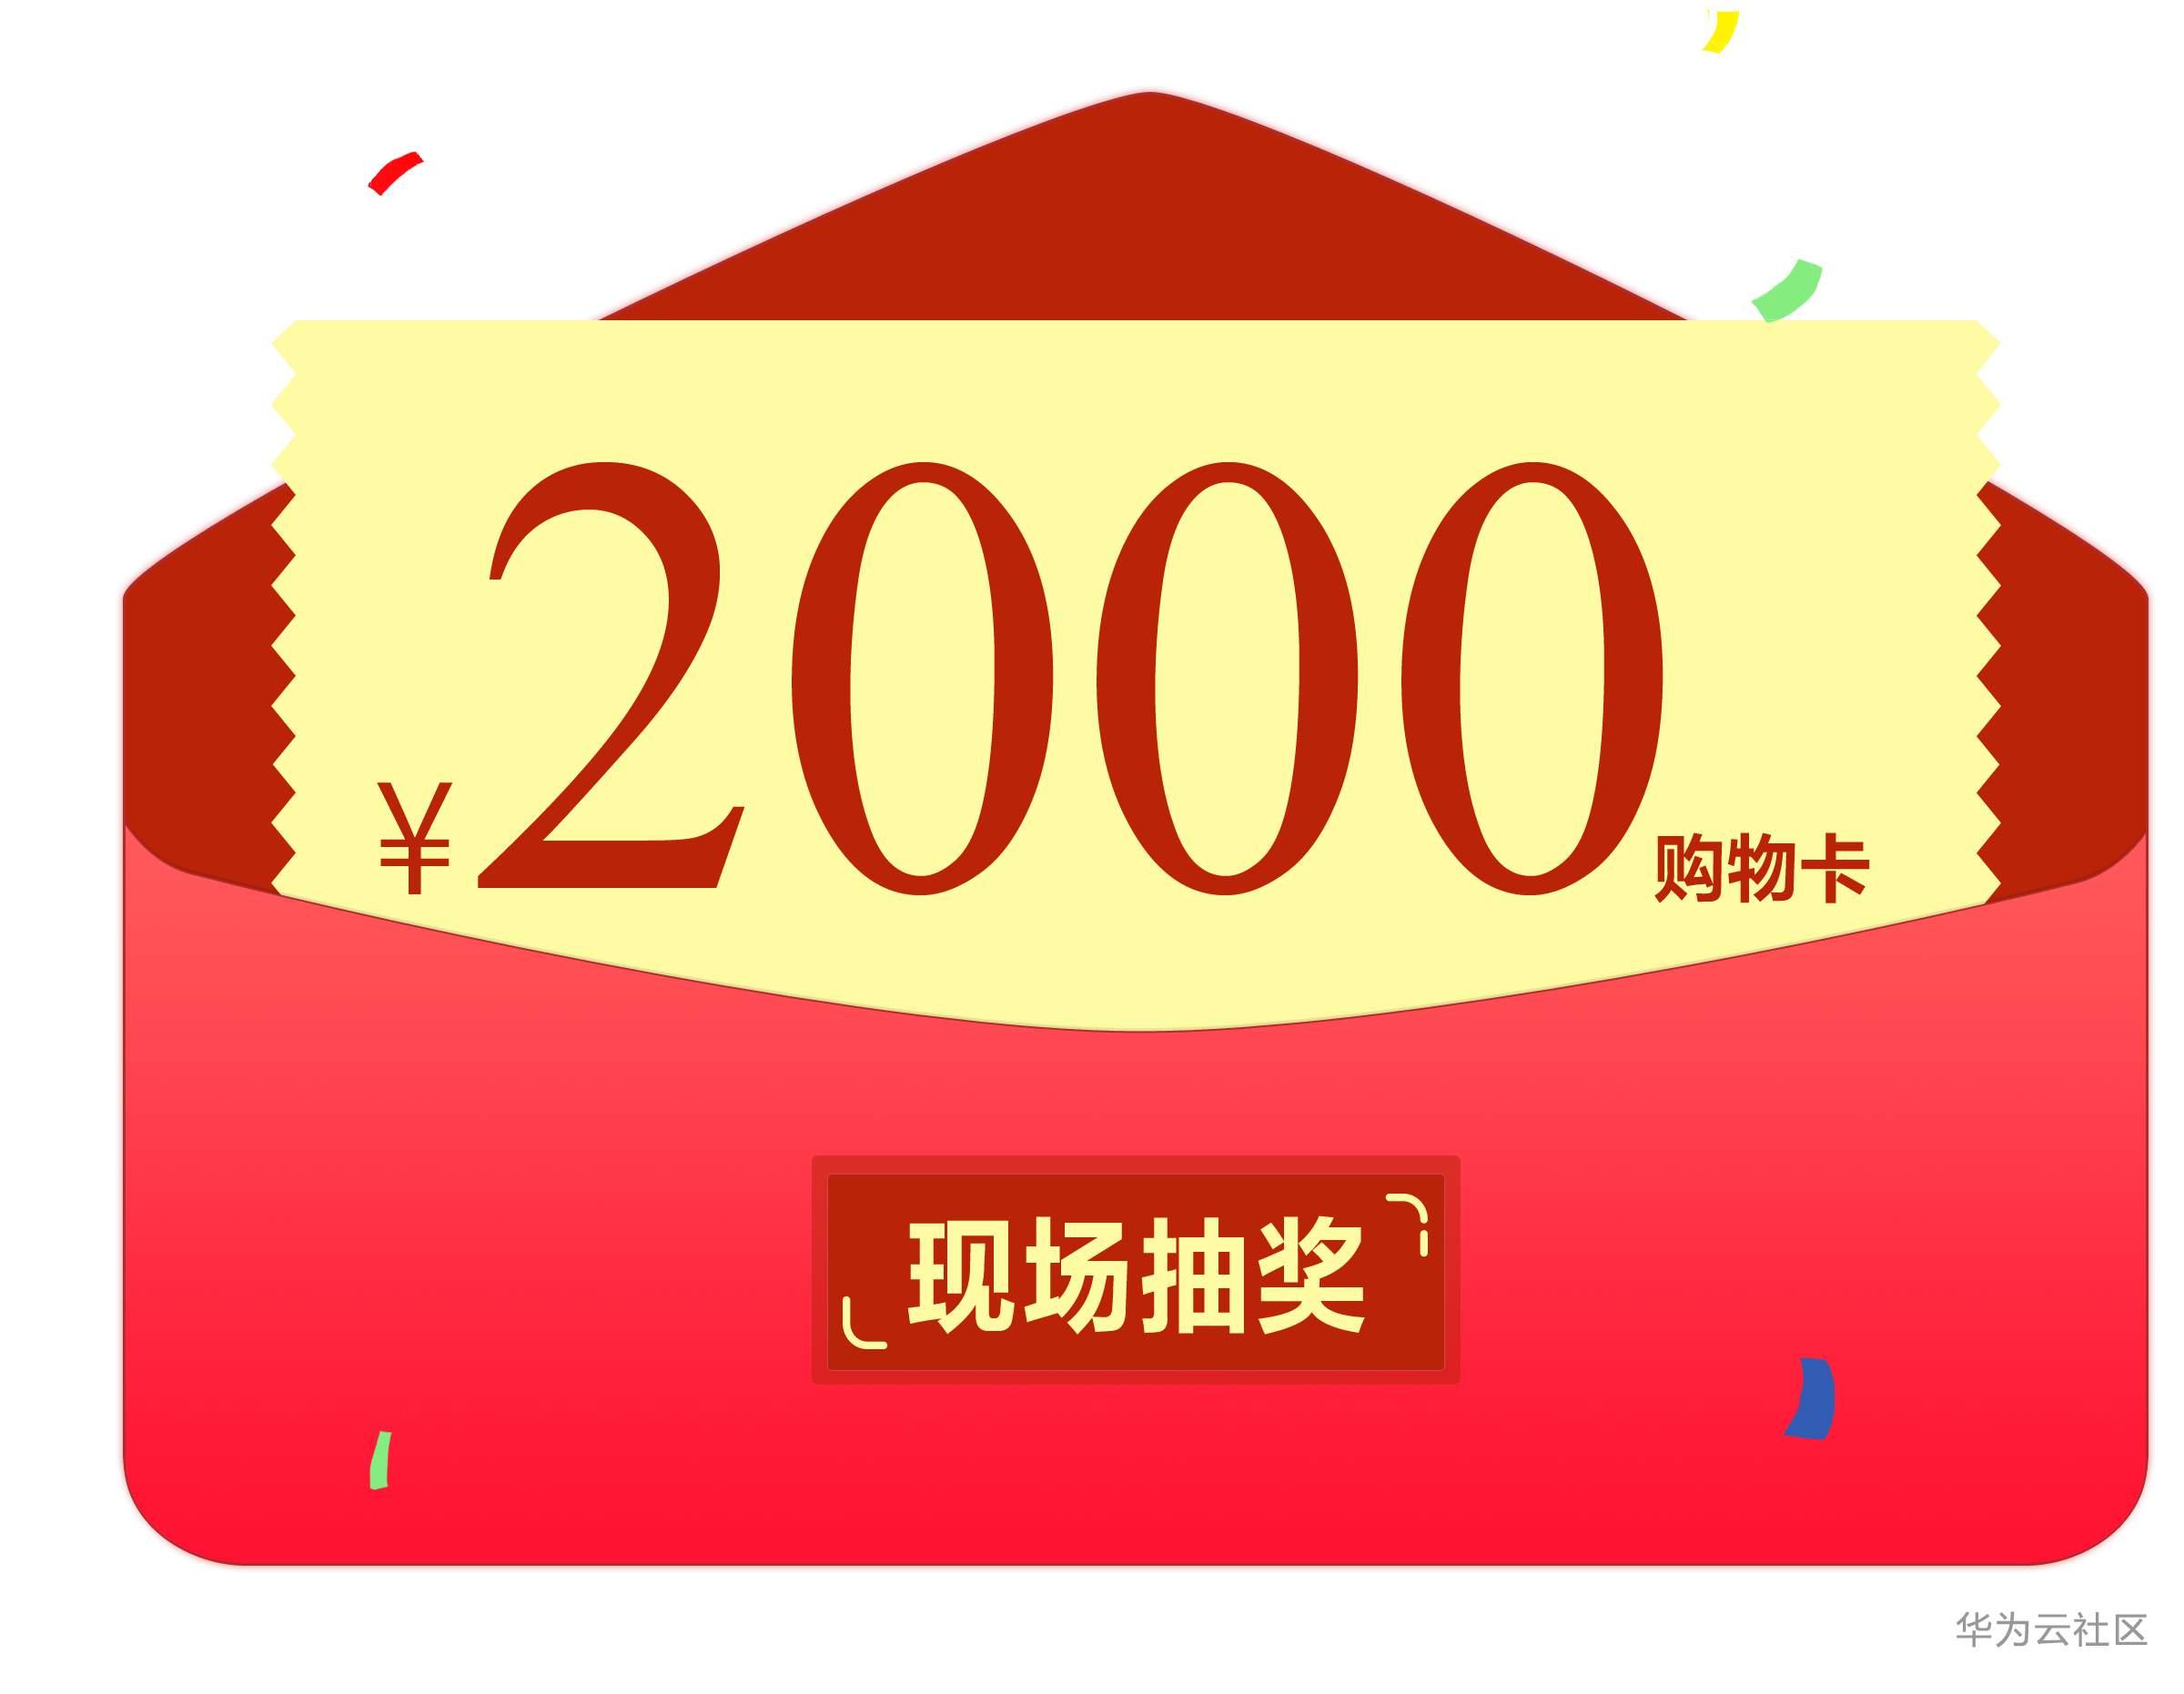 2000购物卡.png